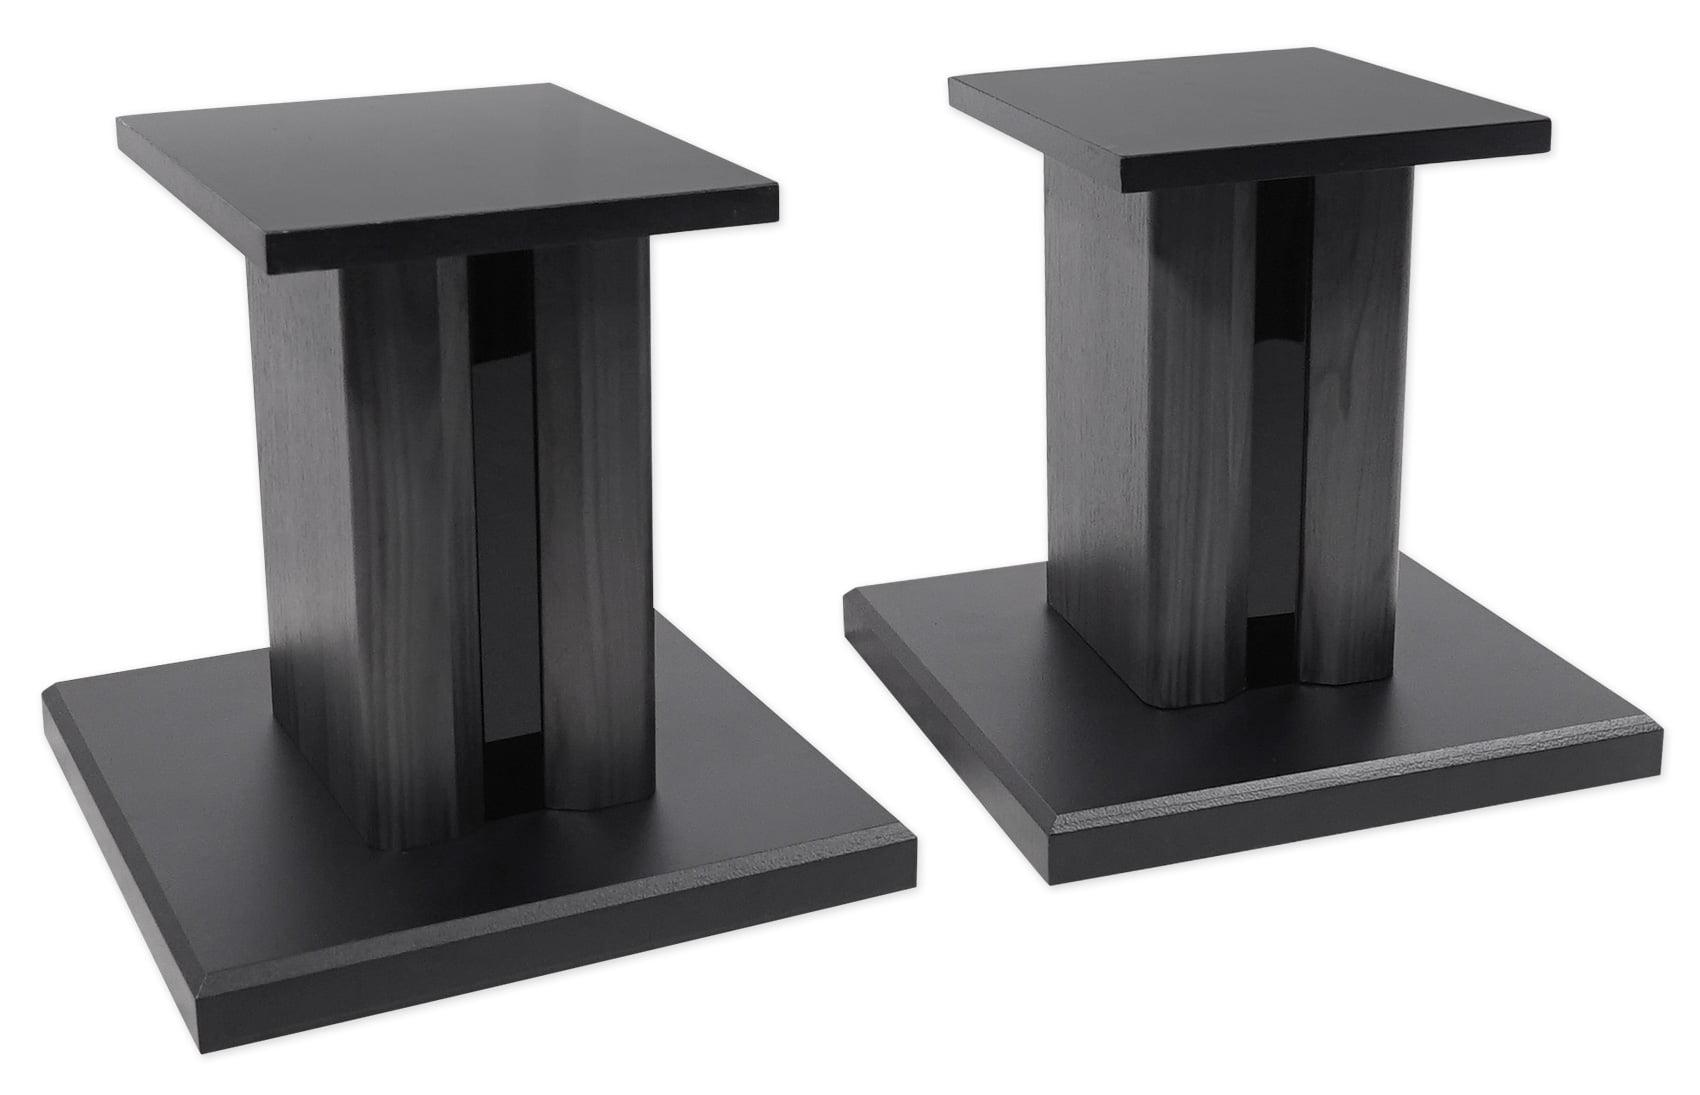 2 technical pro 8 studio monitor bookshelf computer multimedia speaker stands. Black Bedroom Furniture Sets. Home Design Ideas